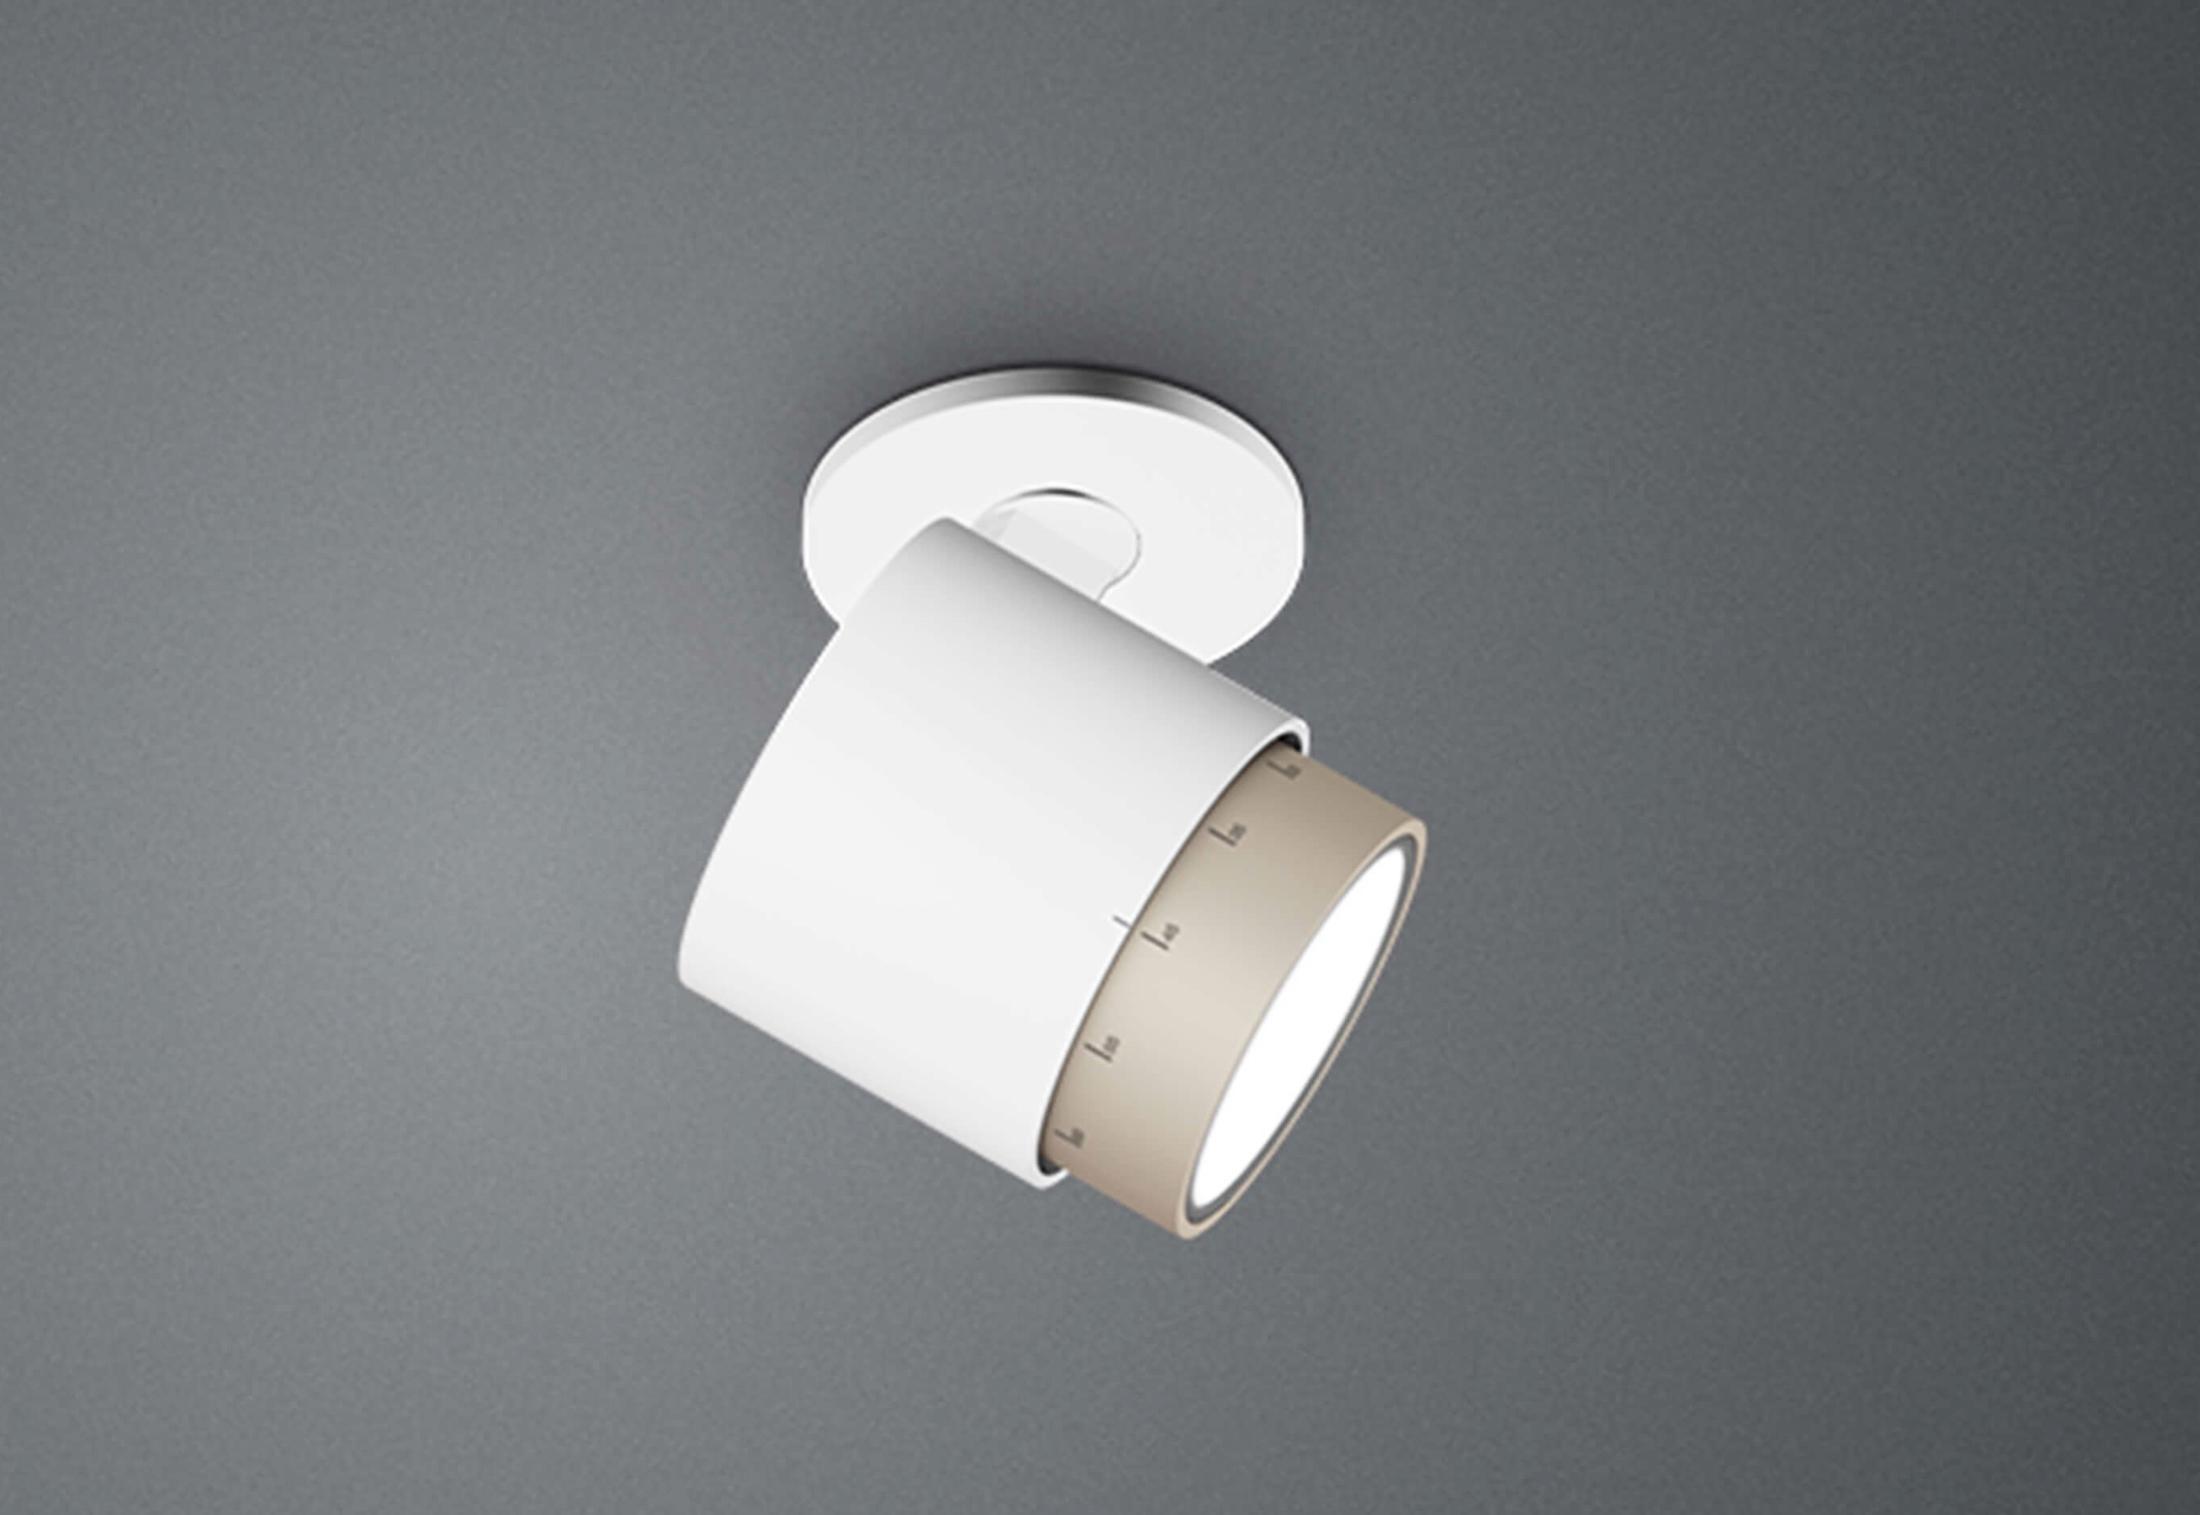 6e4d26f5d32 lui pico ceiling spotlight; lui pico ceiling spotlight ...